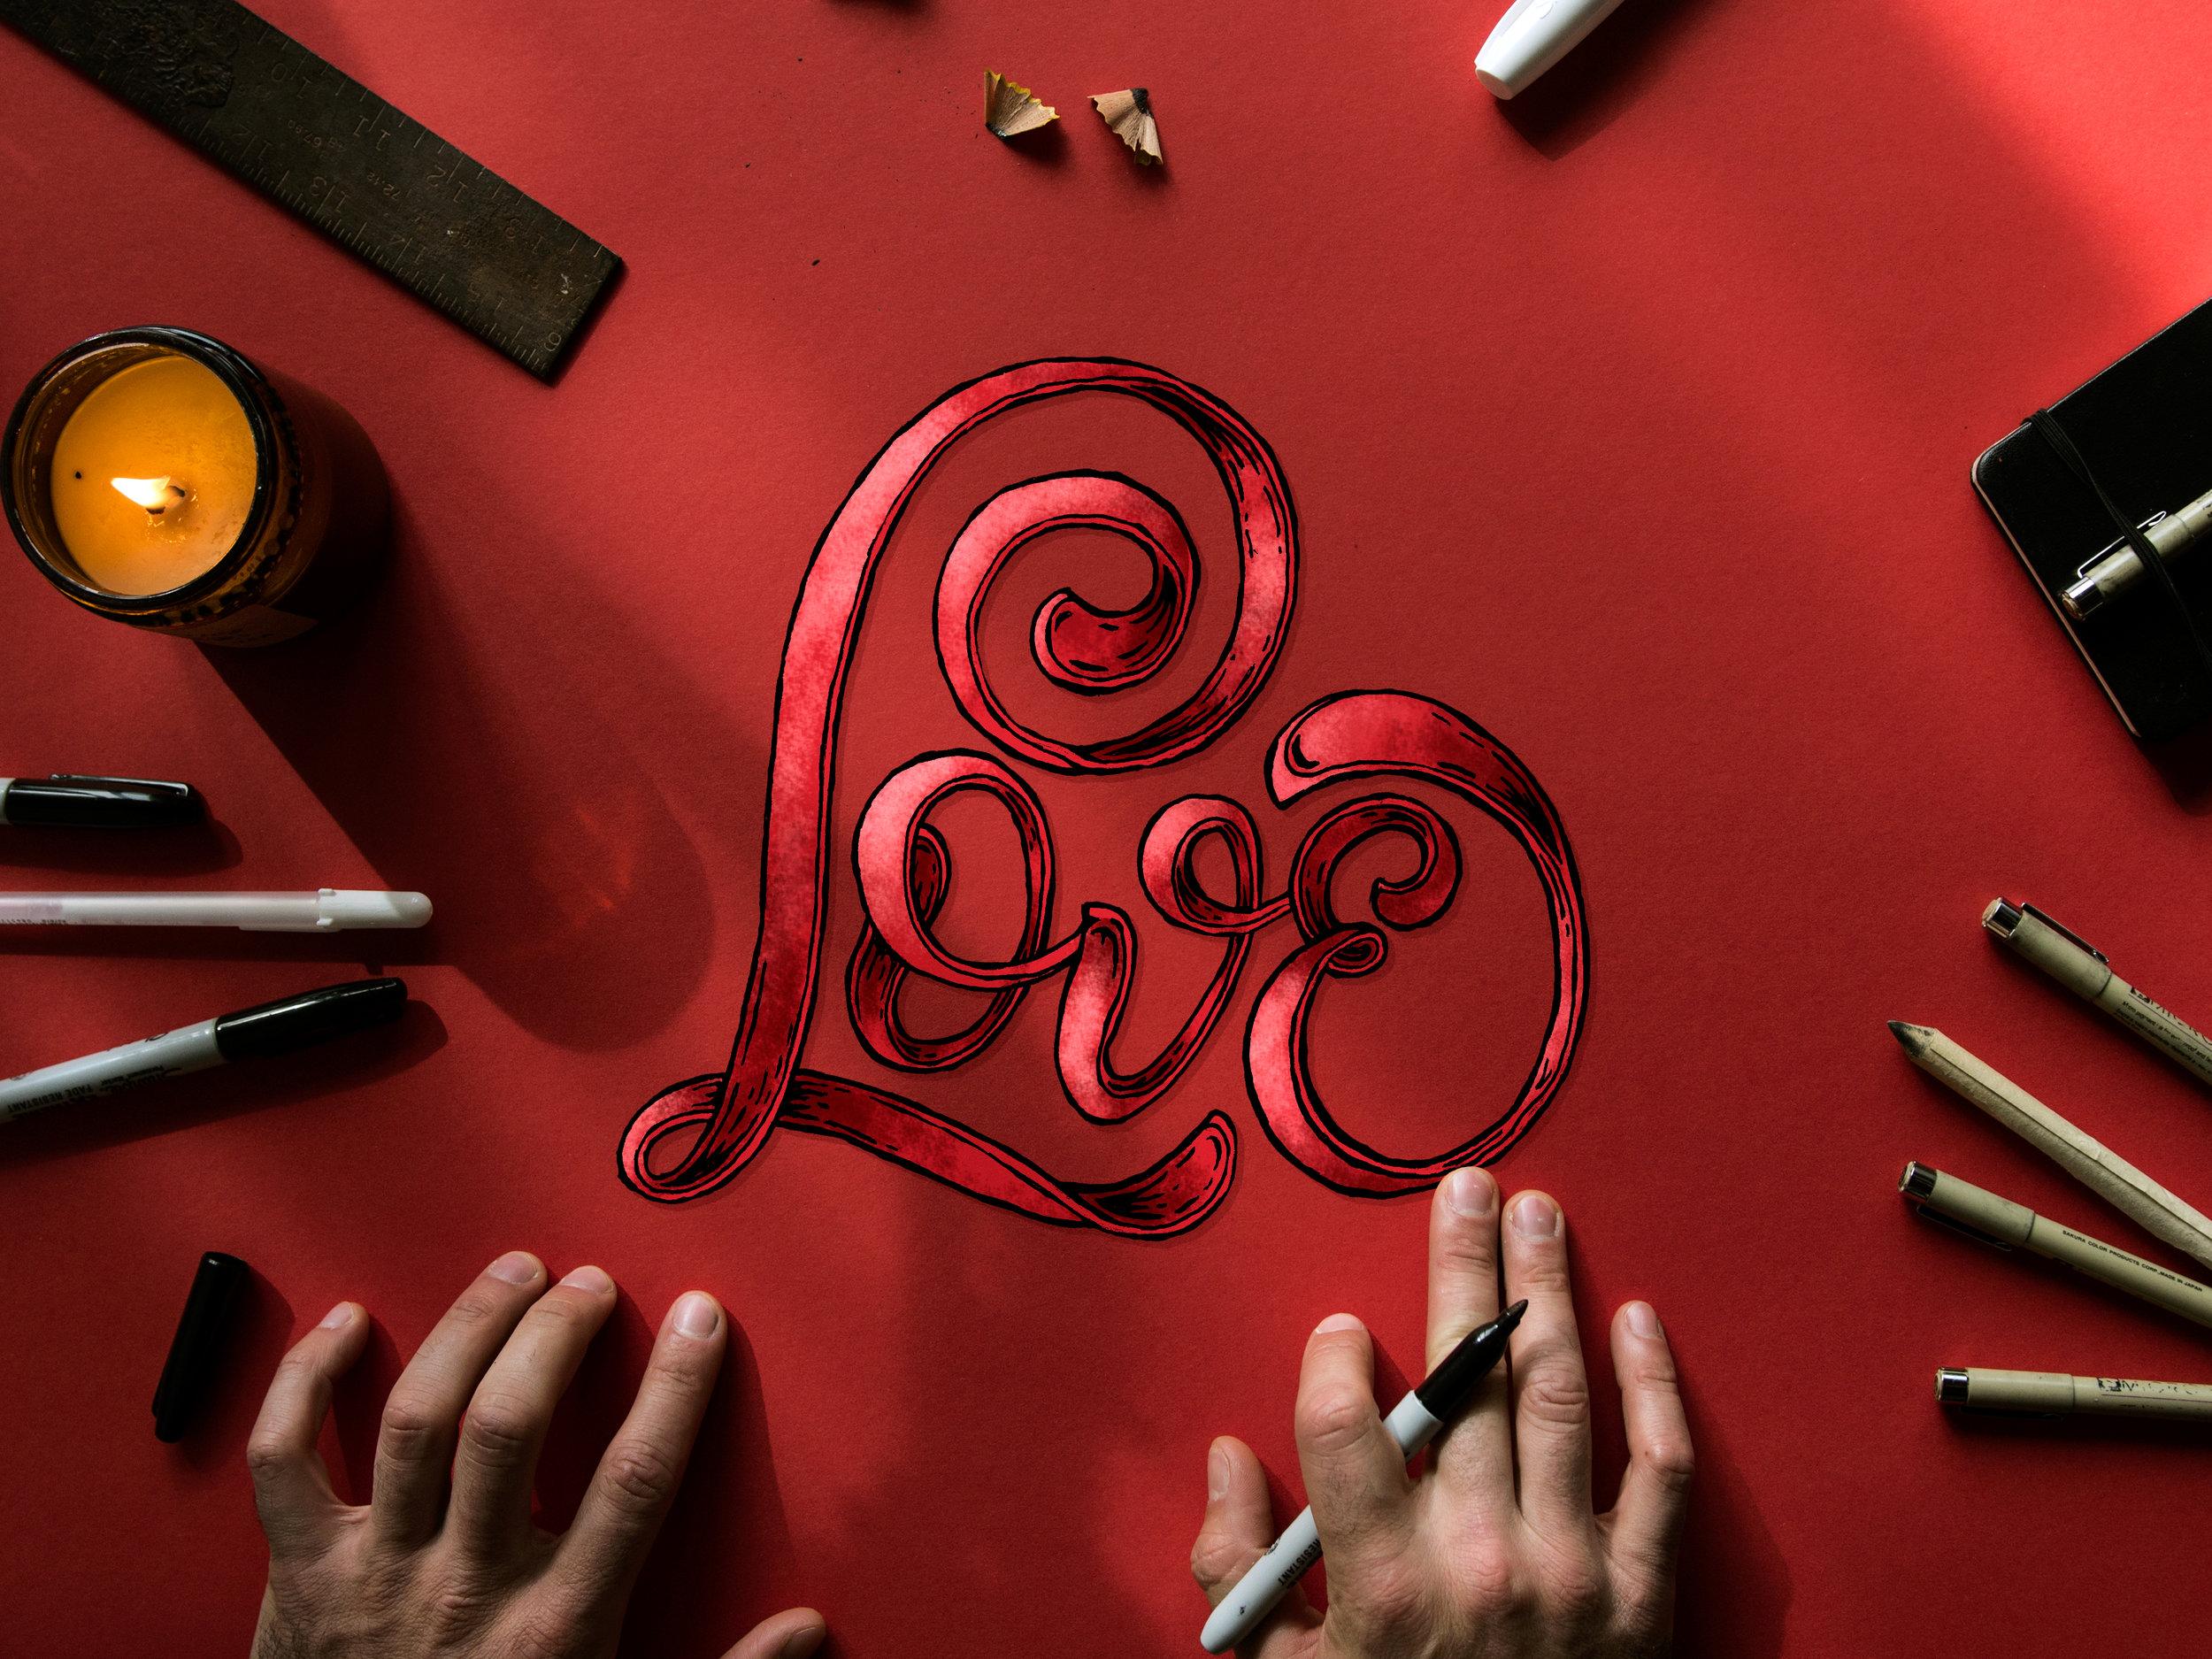 L.InfluencerLettering.Love.Mockup.Red.FNL.jpg